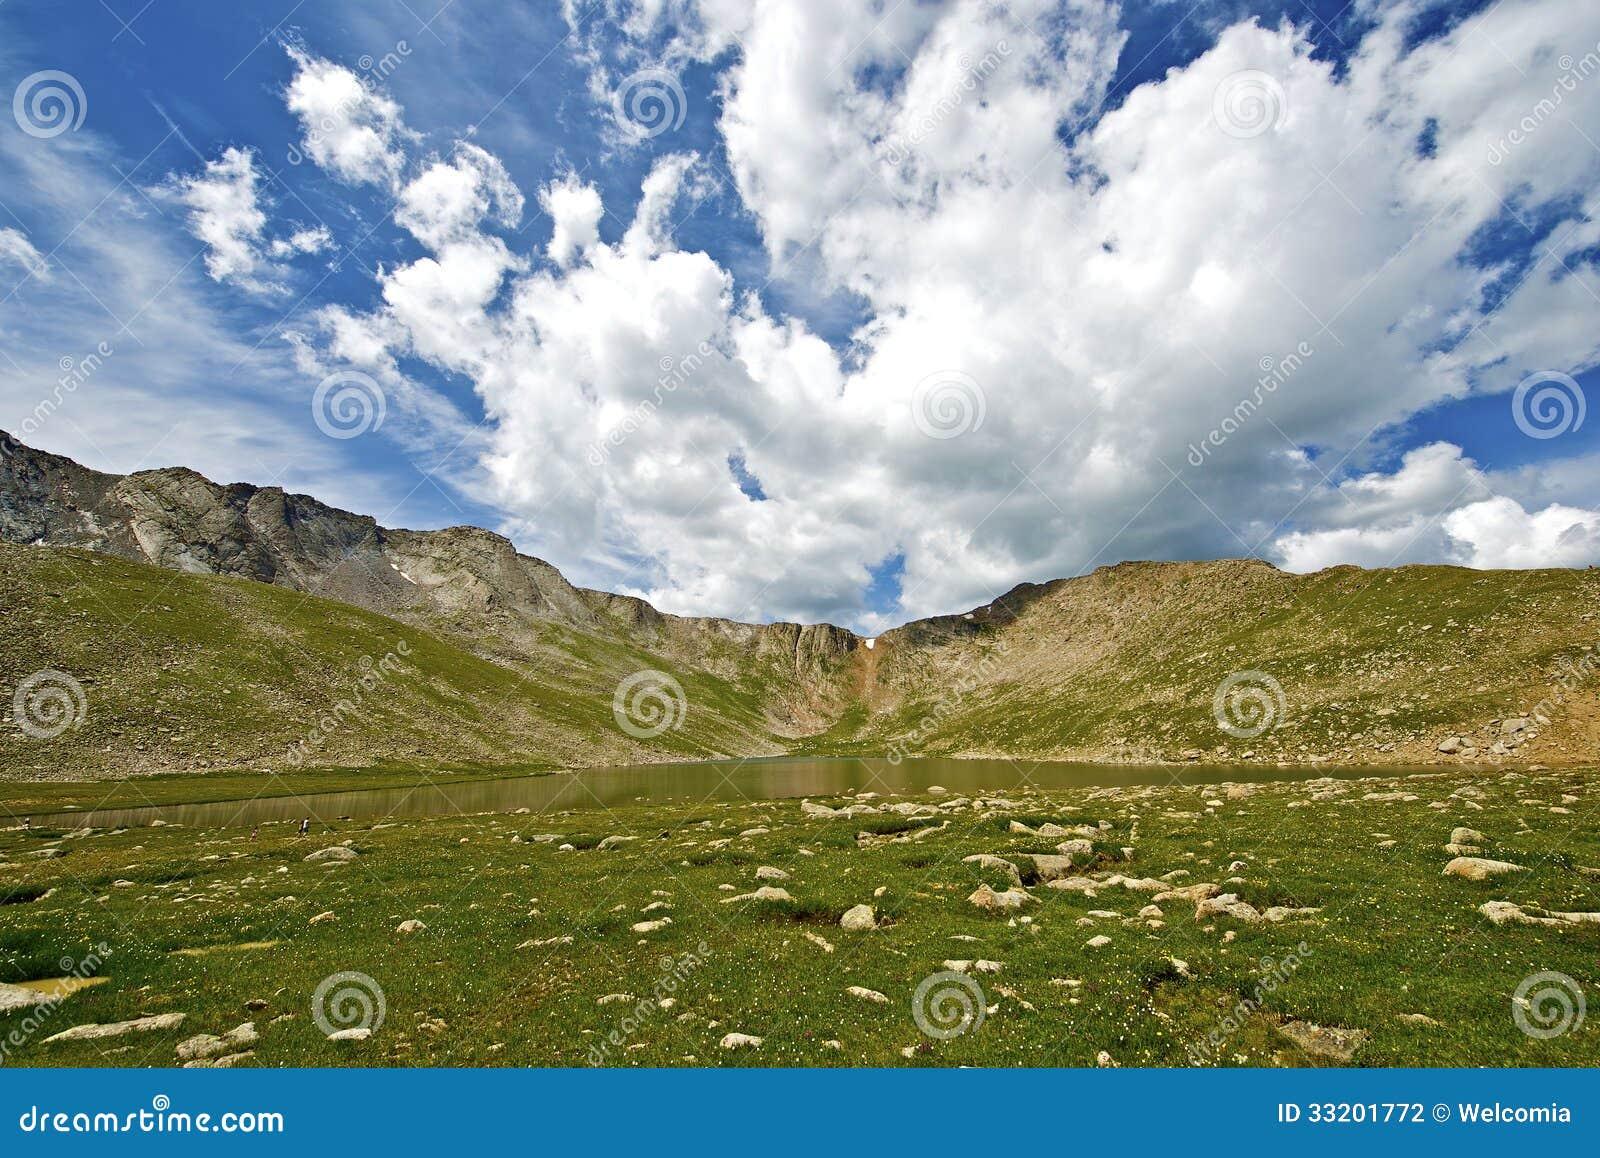 Colorado Alpine Lake Stock Photography - Image: 33201772